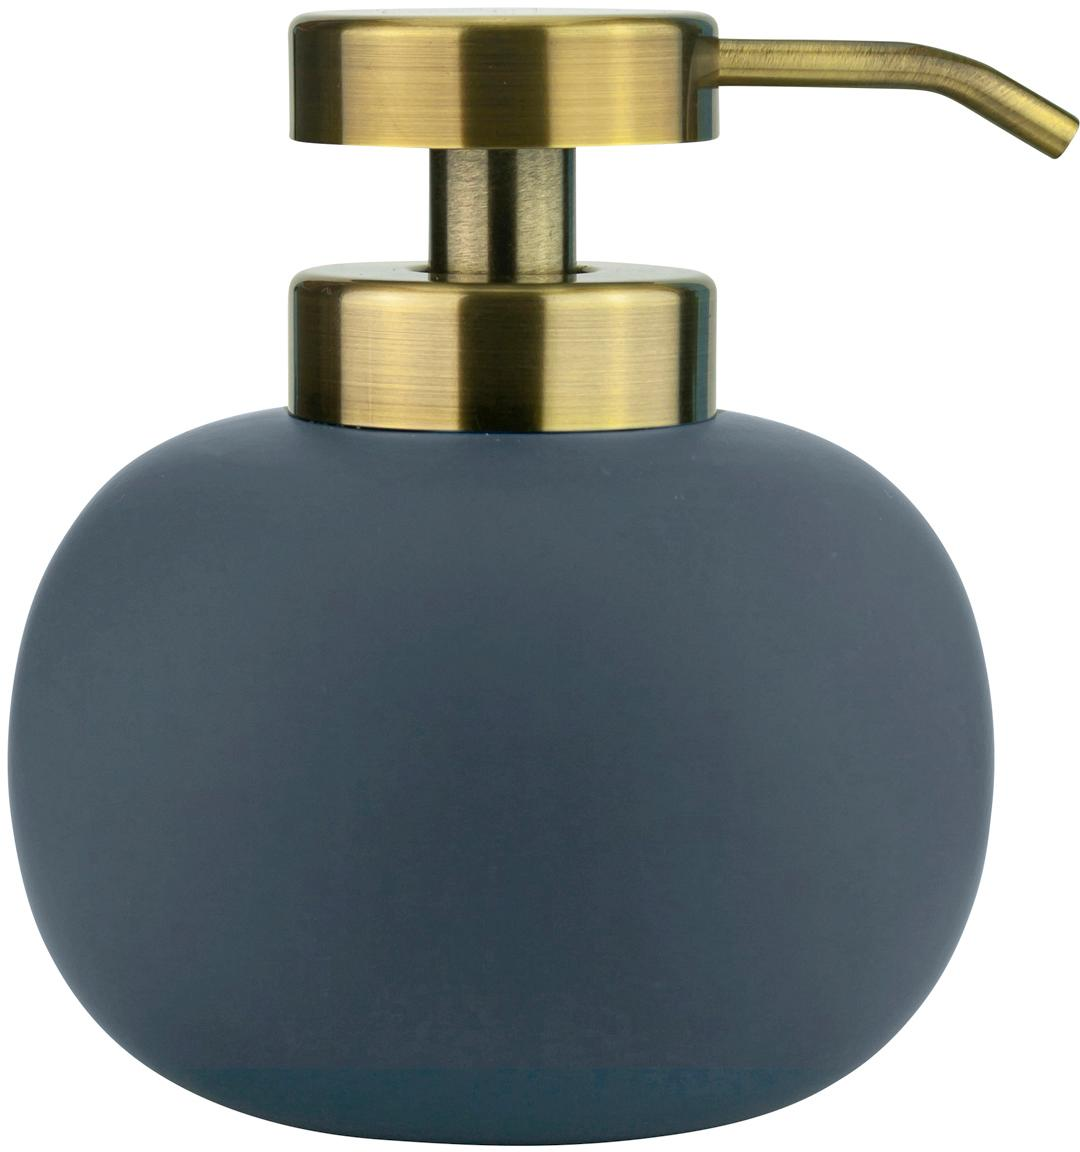 Keramik-Seifenspender Lotus, Behälter: Keramik, Pumpkopf: Metall, beschichtet, Blau, Messingfarben, Ø 11 x H 13 cm